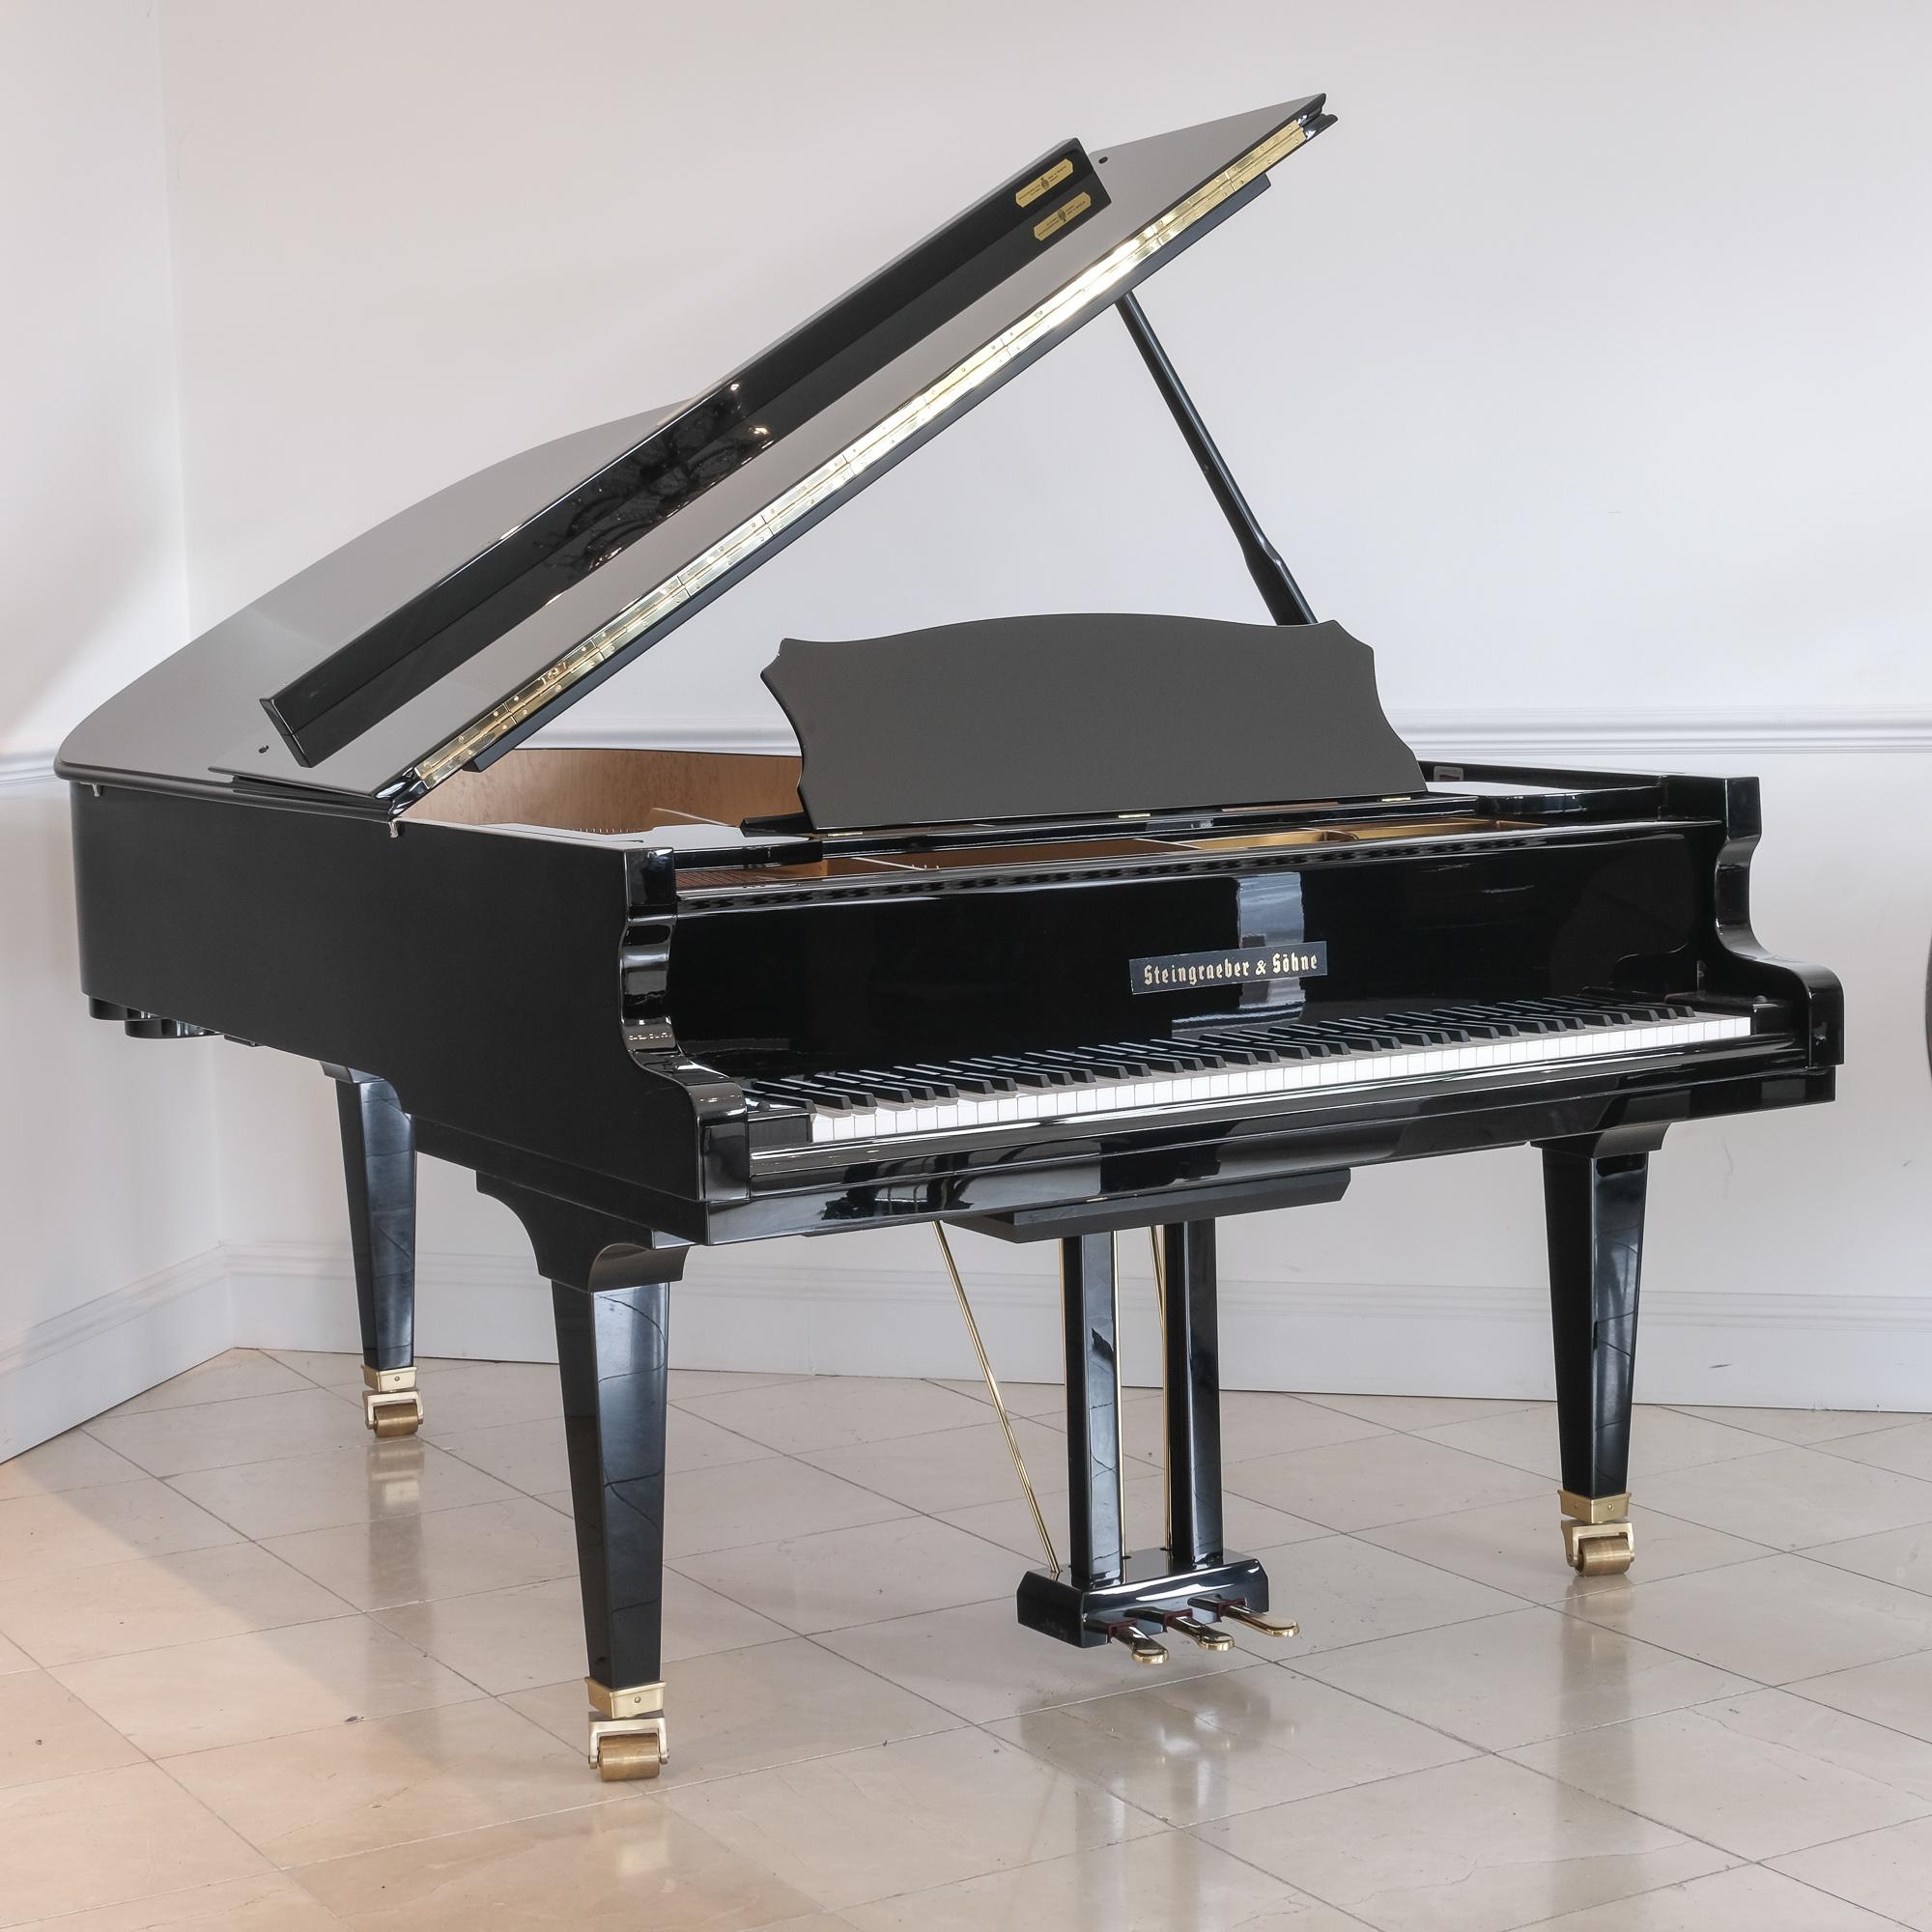 New Steingraeber & Sohne C-212 Grand Piano